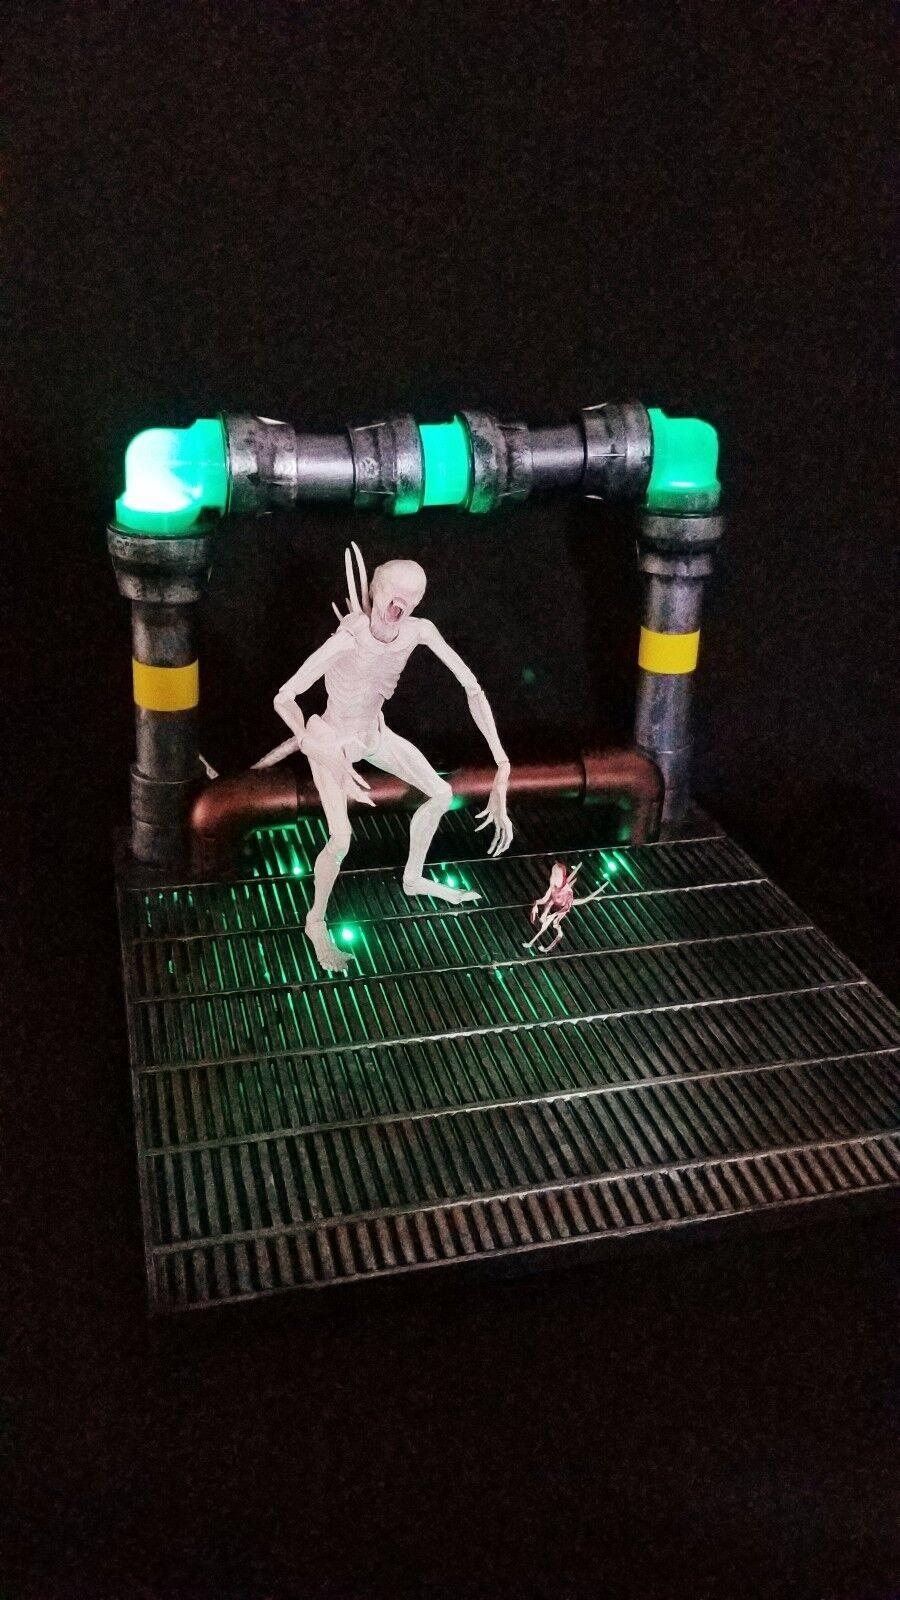 Gree Alien azione cifra Base Base Base Diorama NECA Xenomorph Superhero TMNT Xenowerx cacbcd